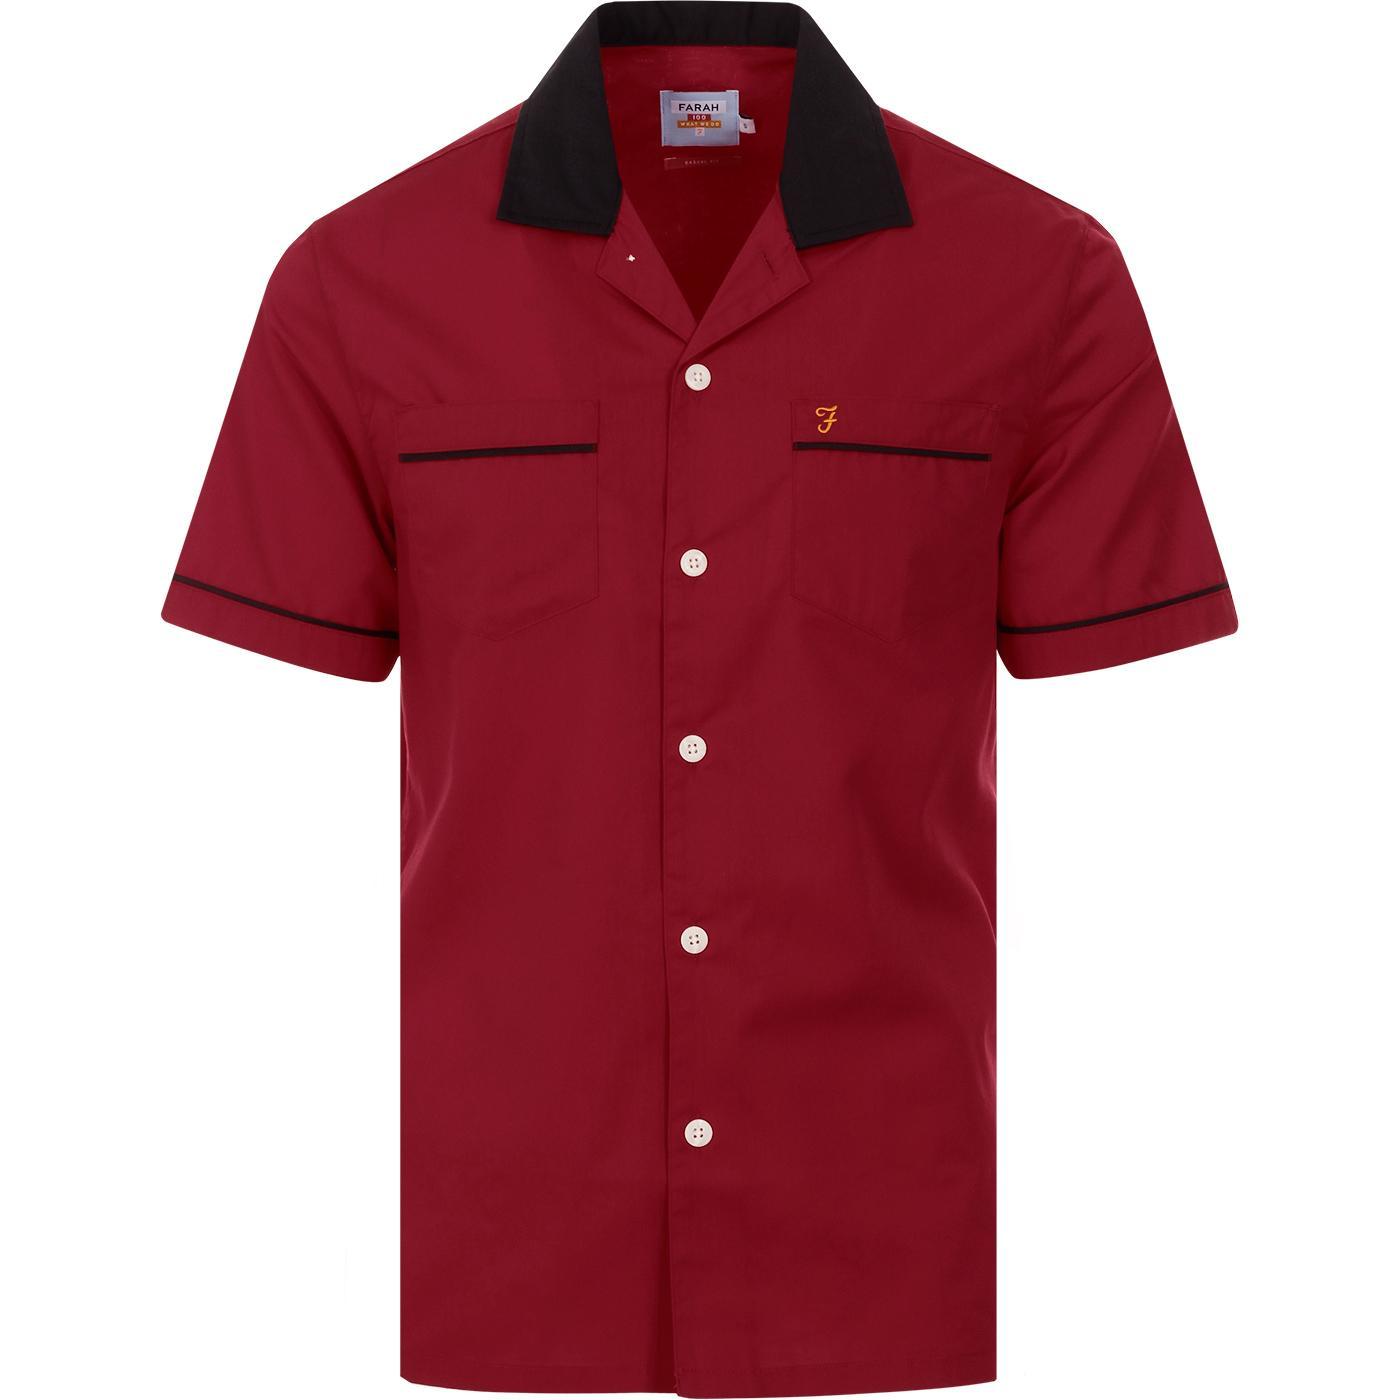 Menard FARAH 100 Retro Revere Collar Bowling Shirt